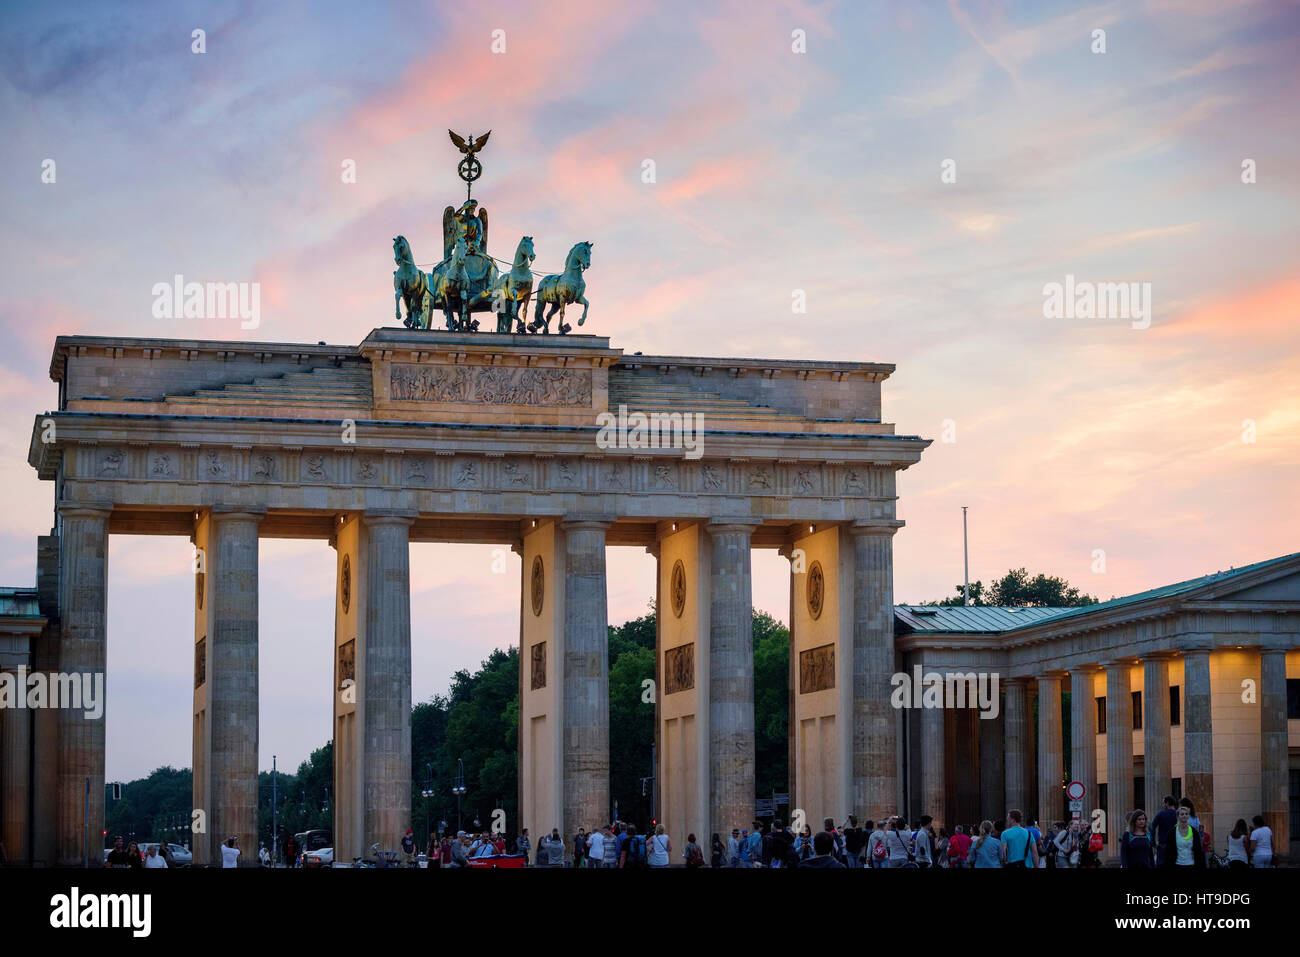 Berlin. Deutschland. Das Brandenburger Tor bei Sonnenuntergang. Stockbild